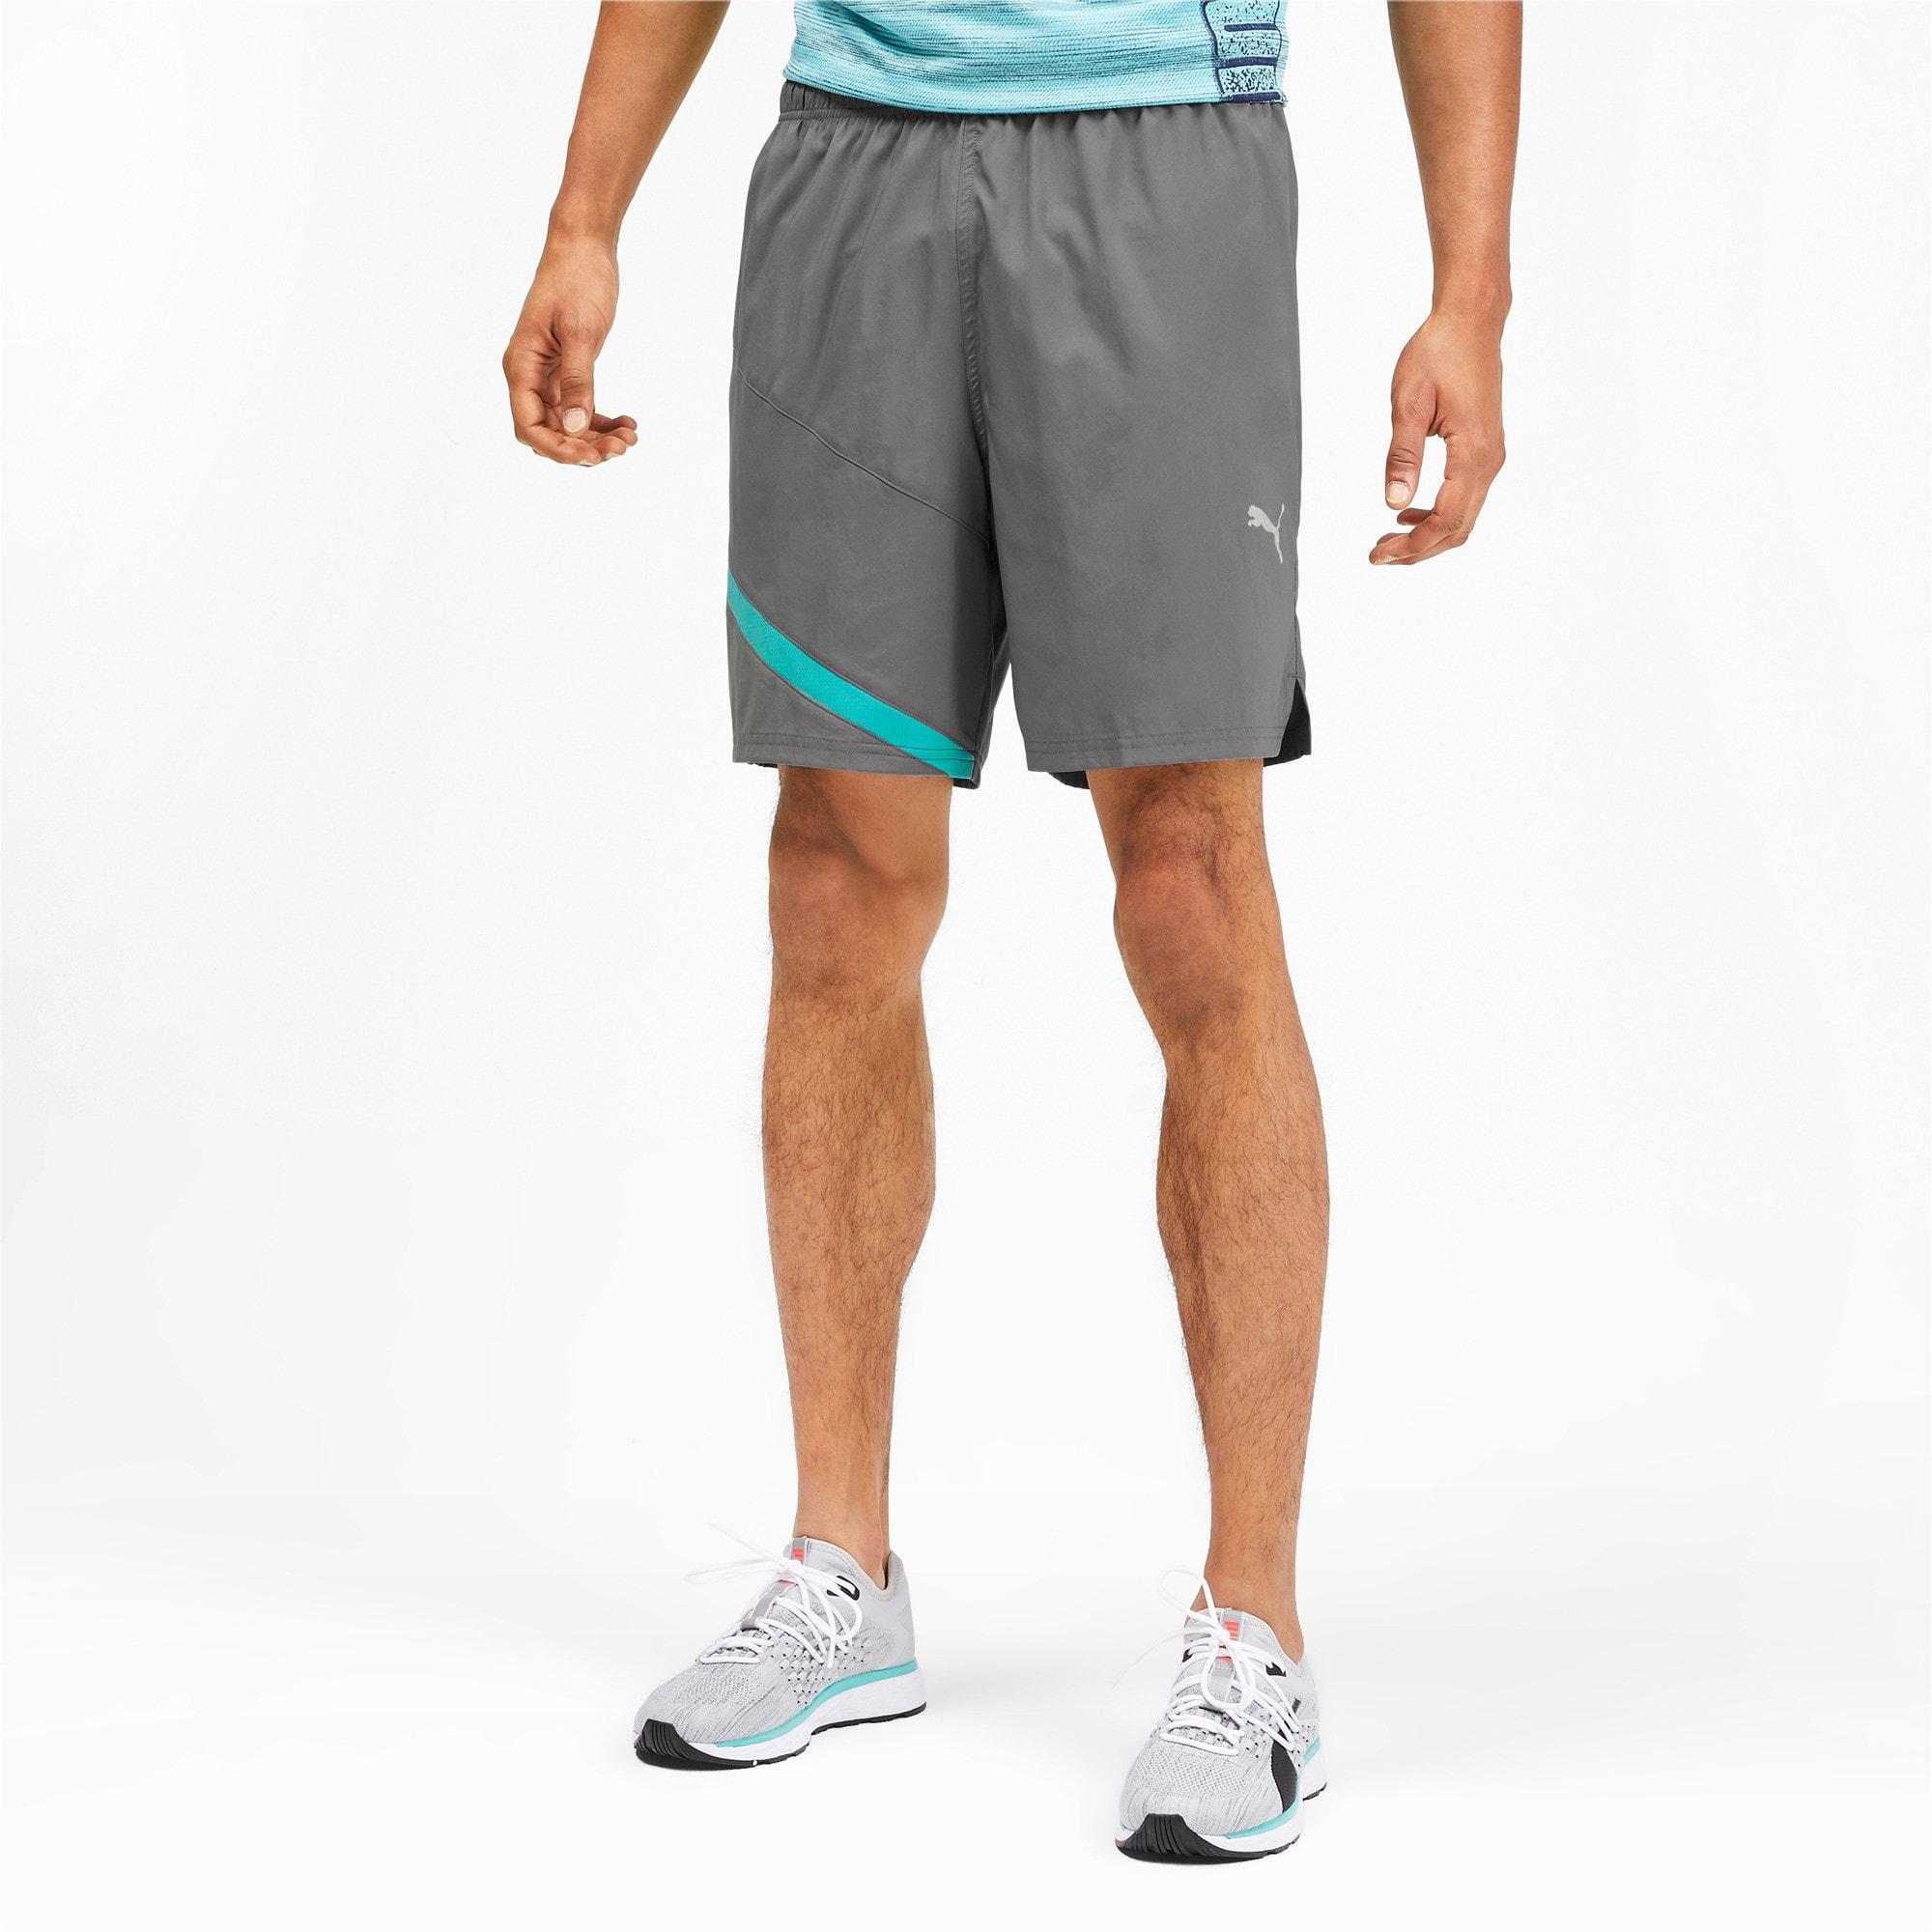 "Thumbnail 1 of Ignite Blocked Men's 7"" Shorts, CASTLEROCK-Blue Turquoise, medium"